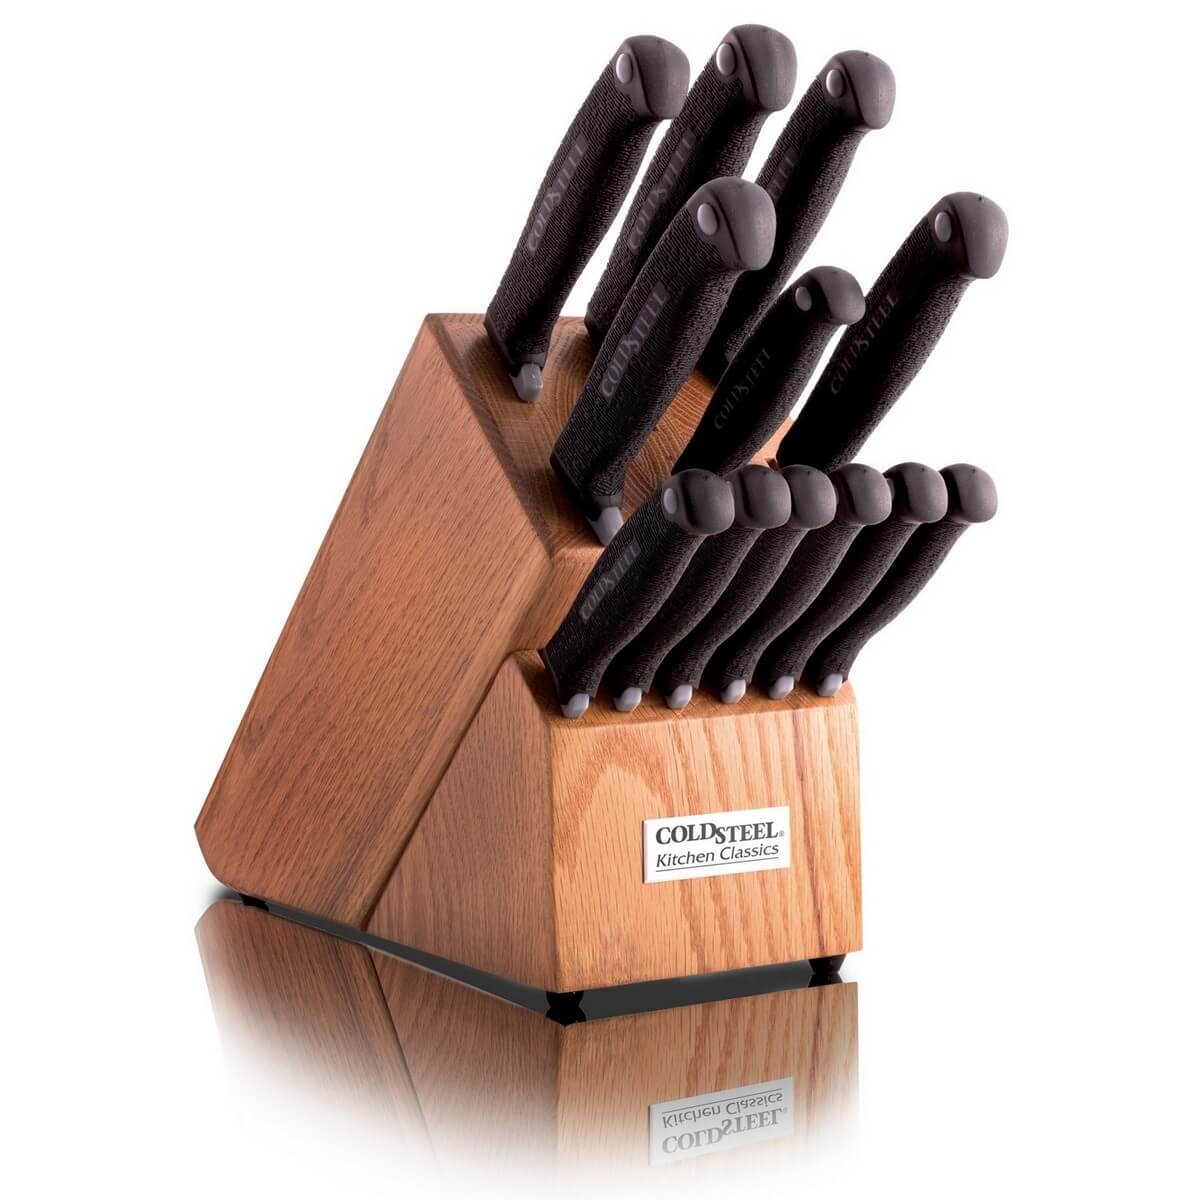 cold steel kitchen classic set knife 59kset ninjaready